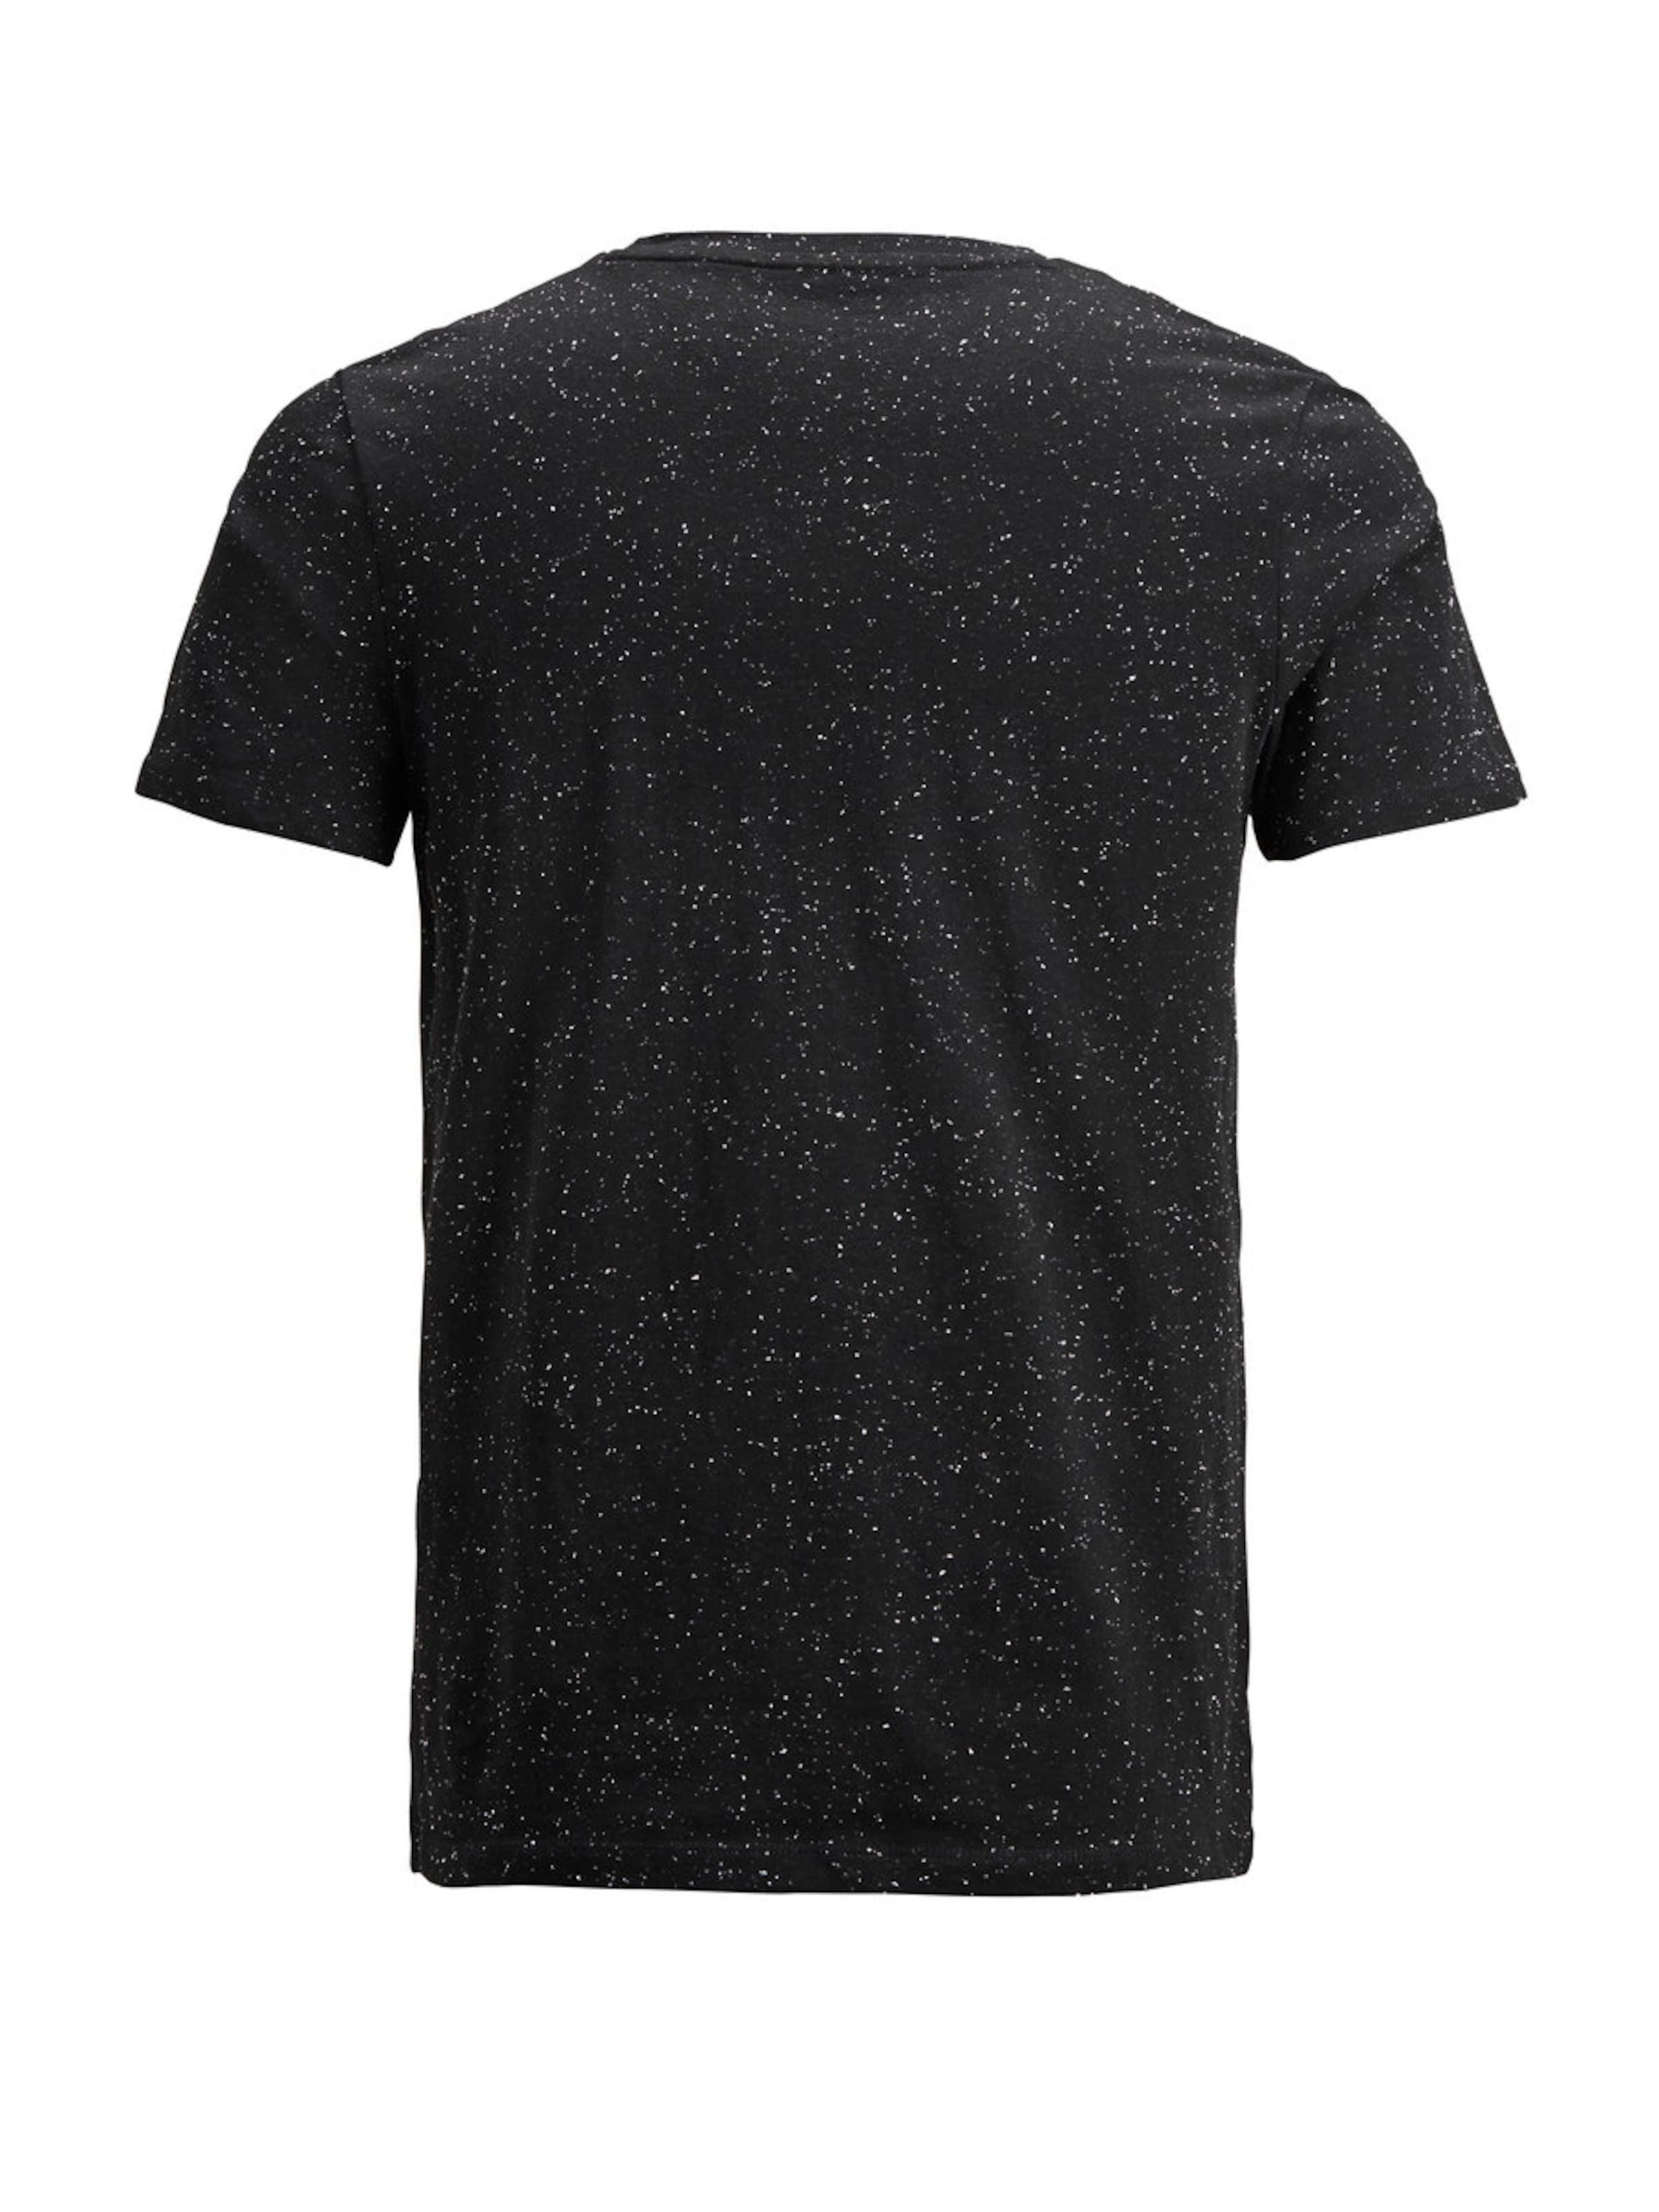 PinkSchwarz In Jackamp; shirt Jones T 8w0PkNnOXZ